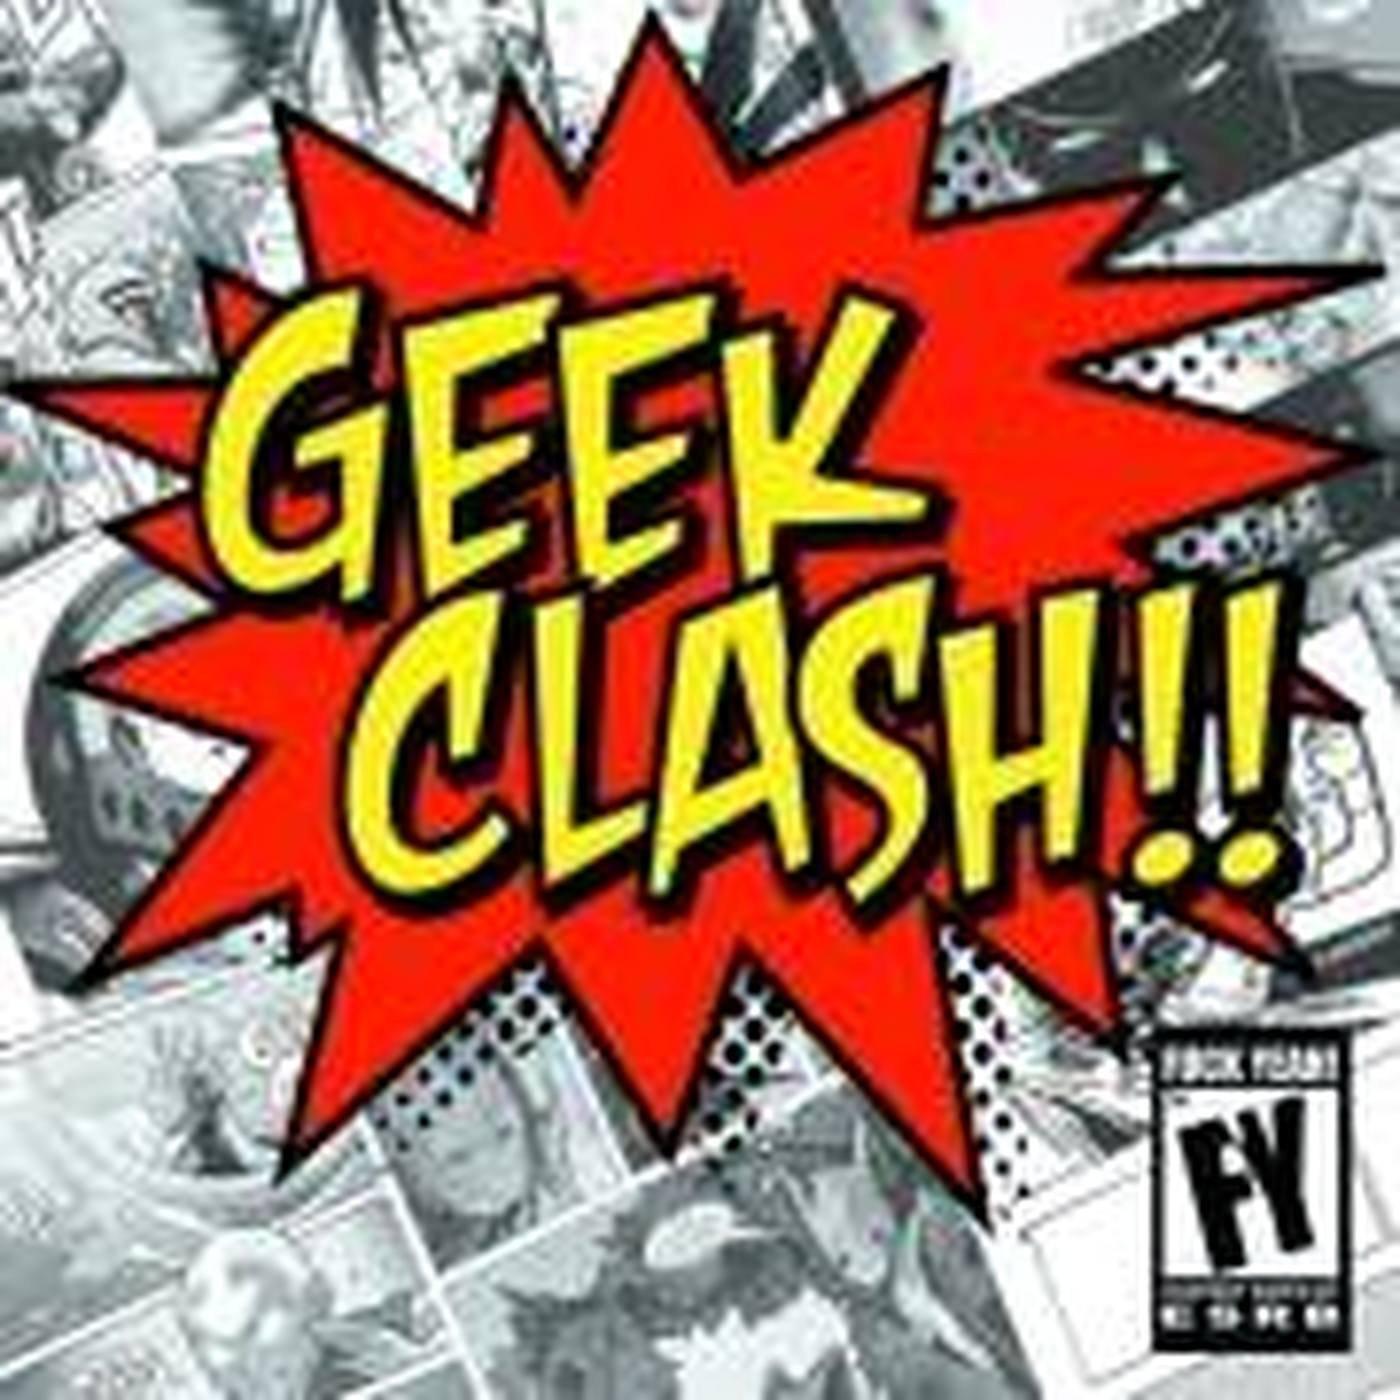 <![CDATA[Geek Clash Podcast]]>